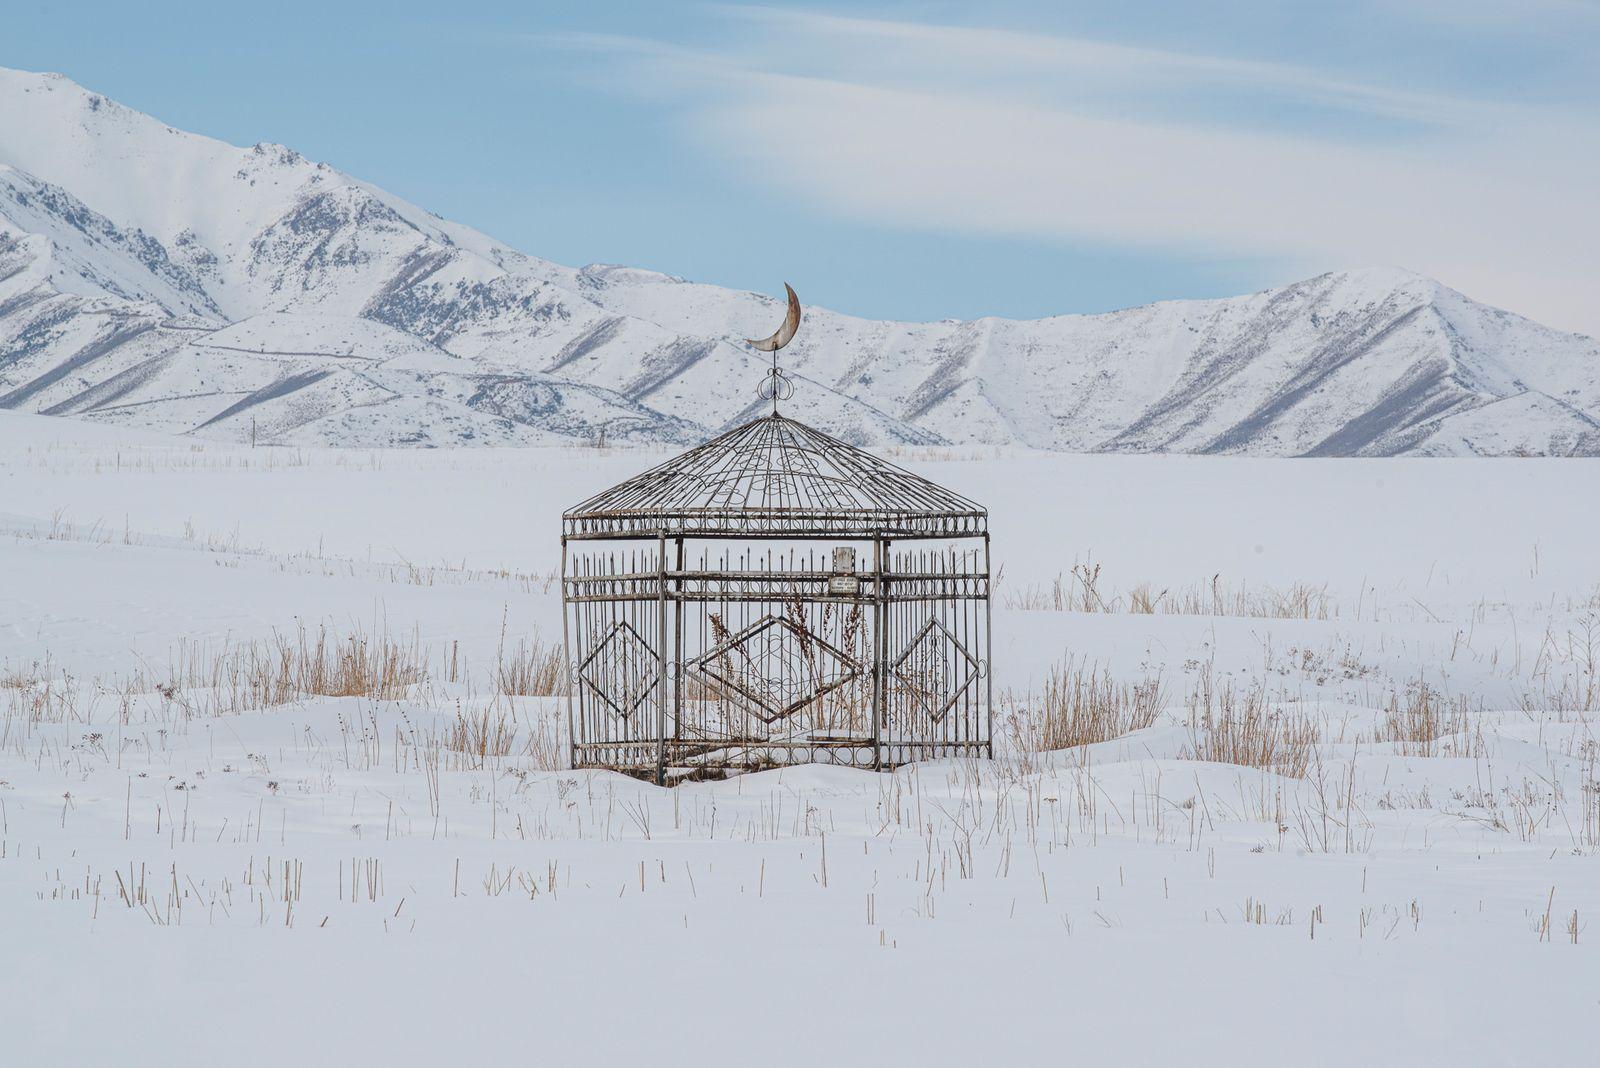 The Last Yurt